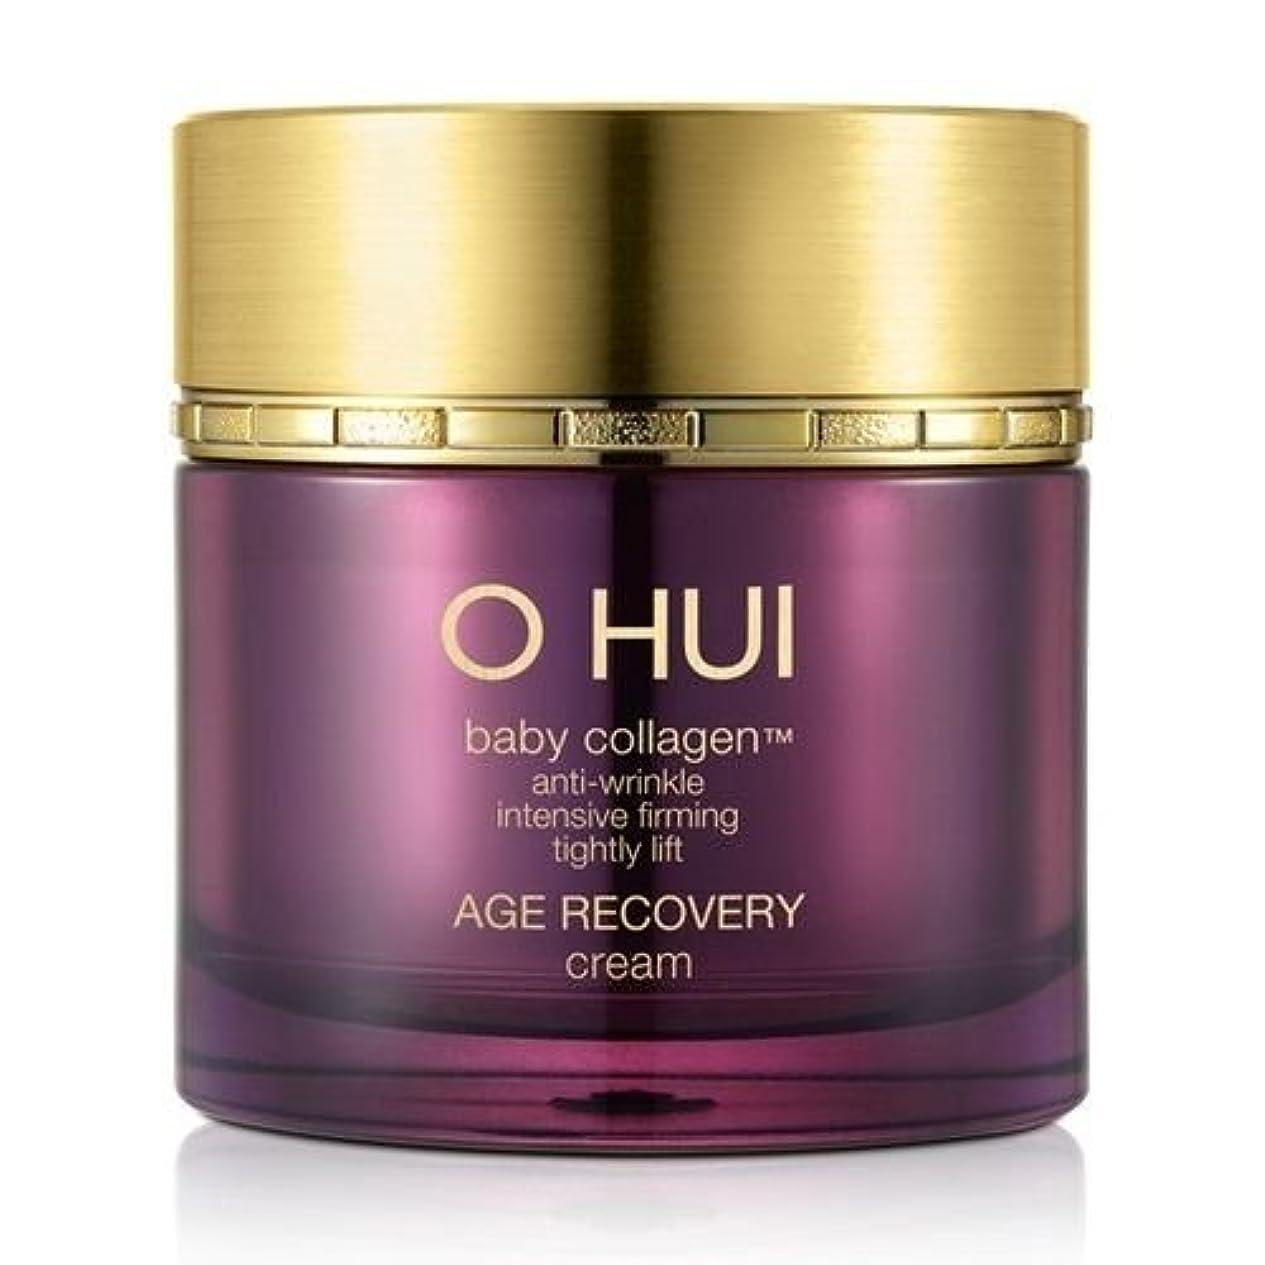 不満高潔な鋸歯状OHUI Age recovery Cream 50ml シワ改善機能性化粧品 [並行輸入品]